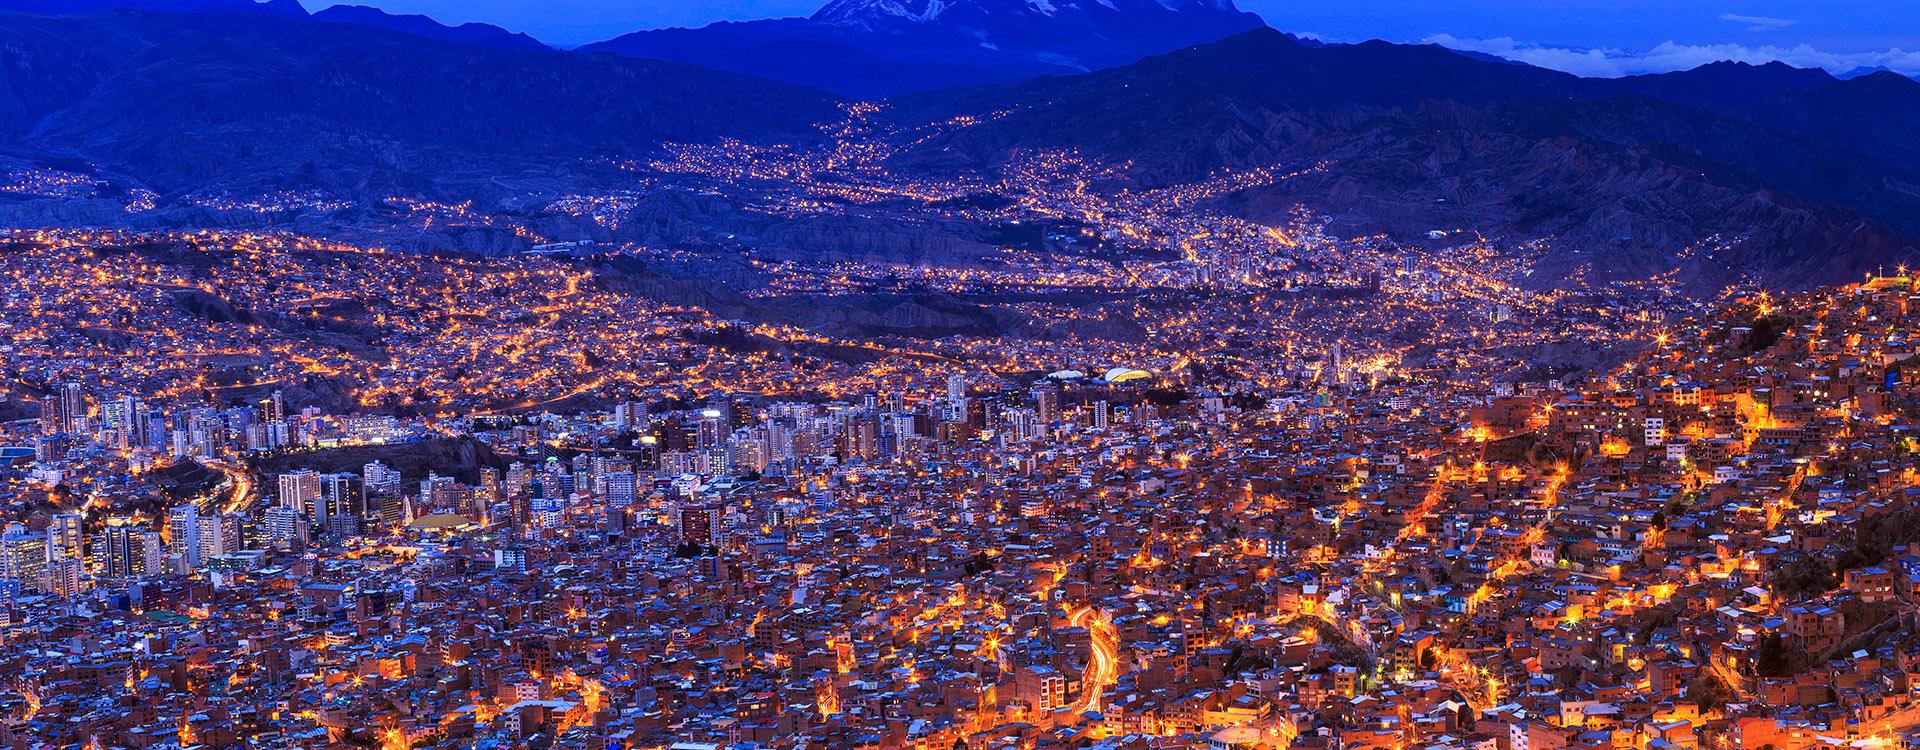 Night view of La Paz, Bolivia